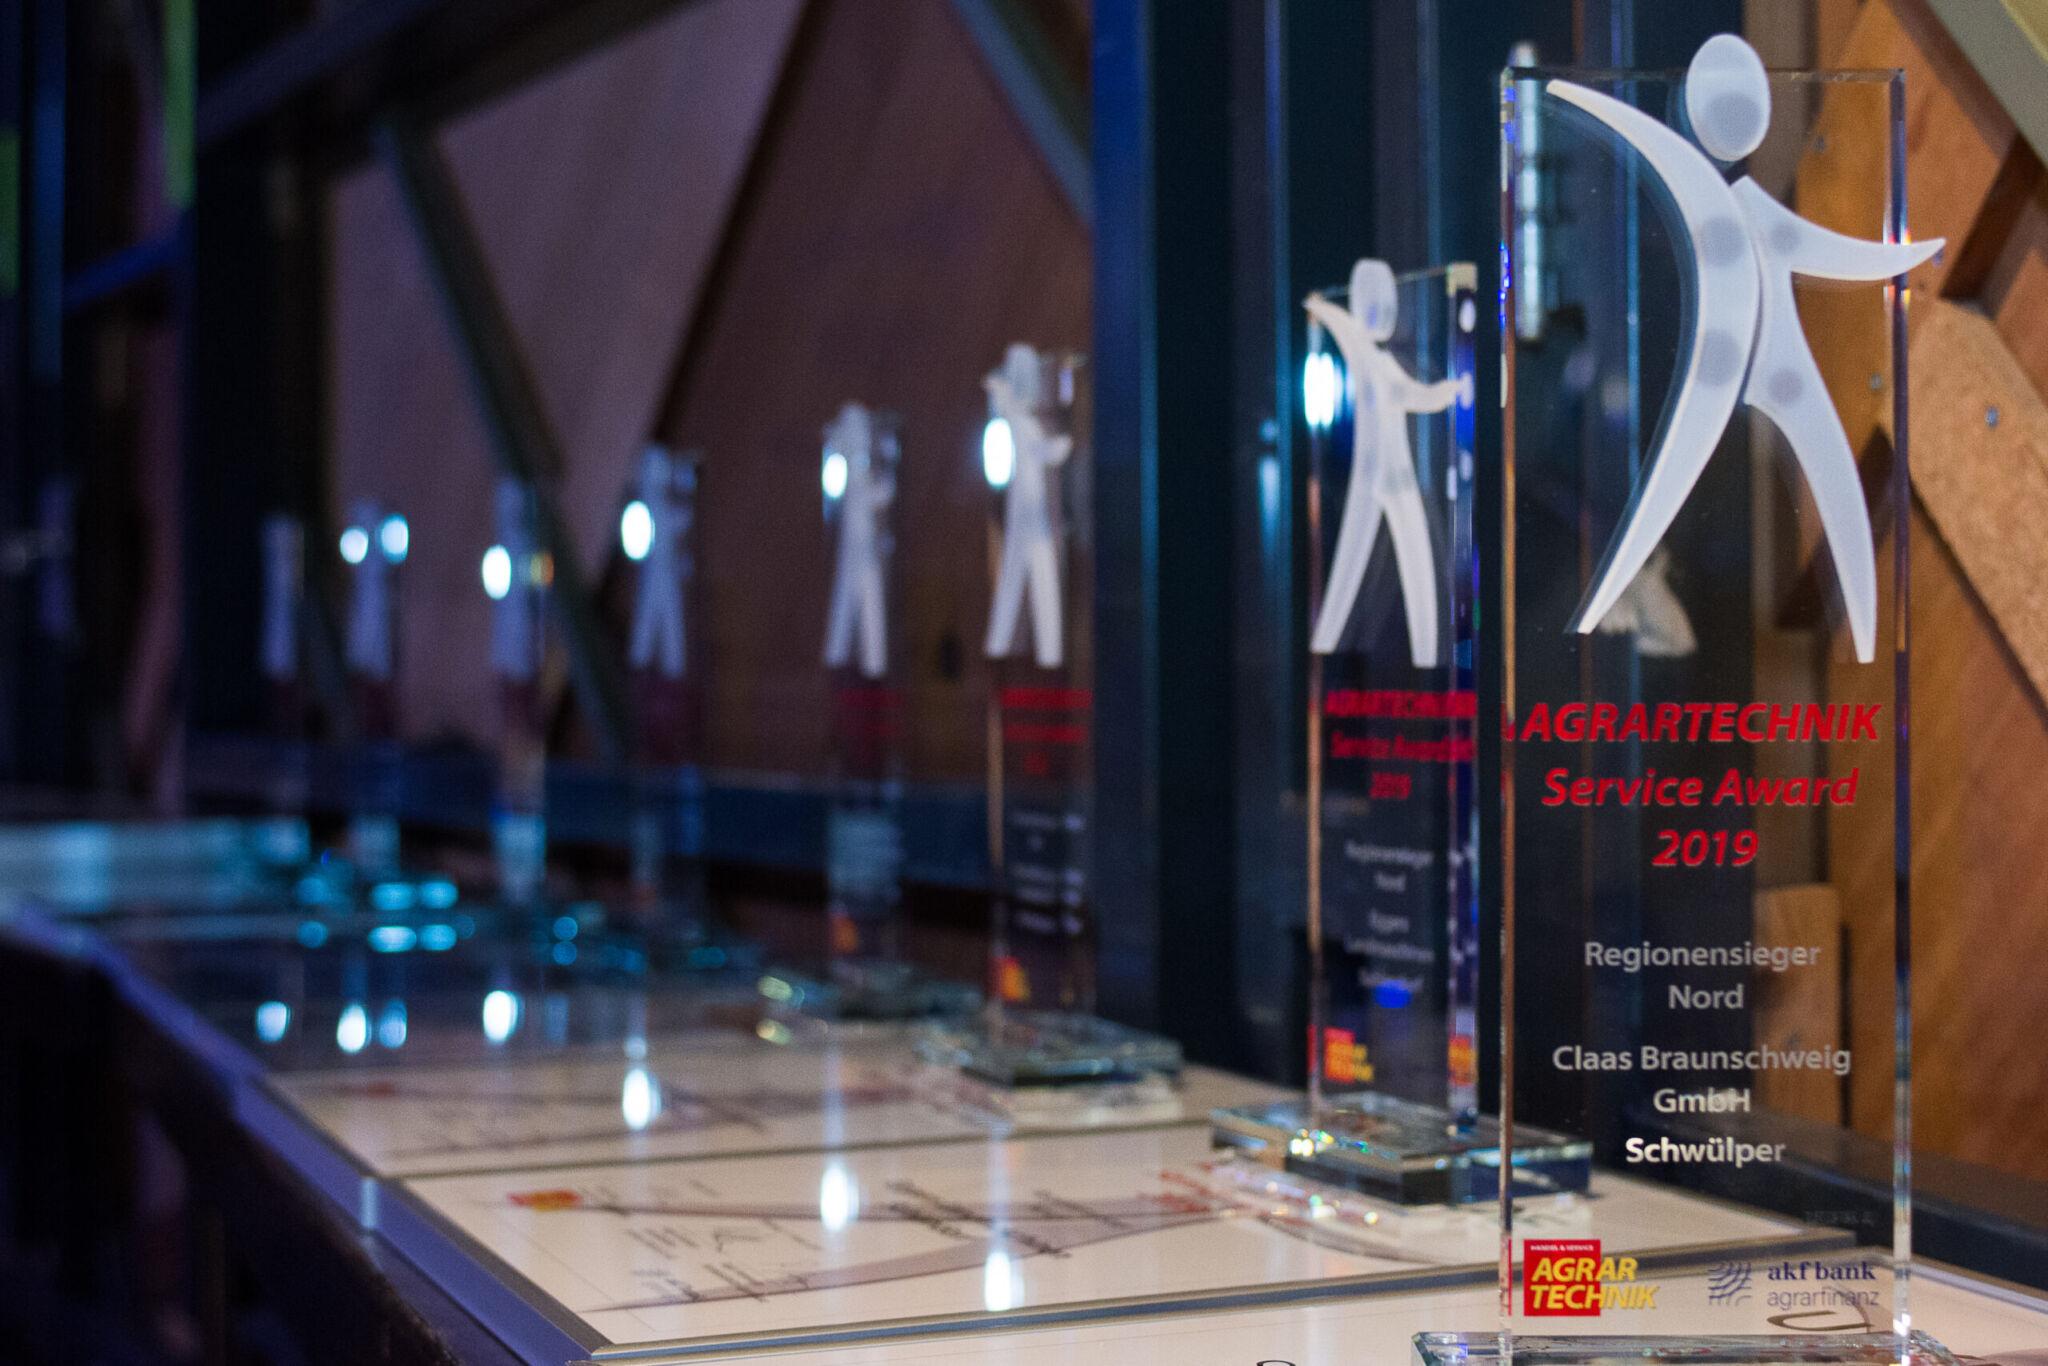 AGRARTECHNIK Service-Award |copyright: Michael Palm für AGRARTECHNIK